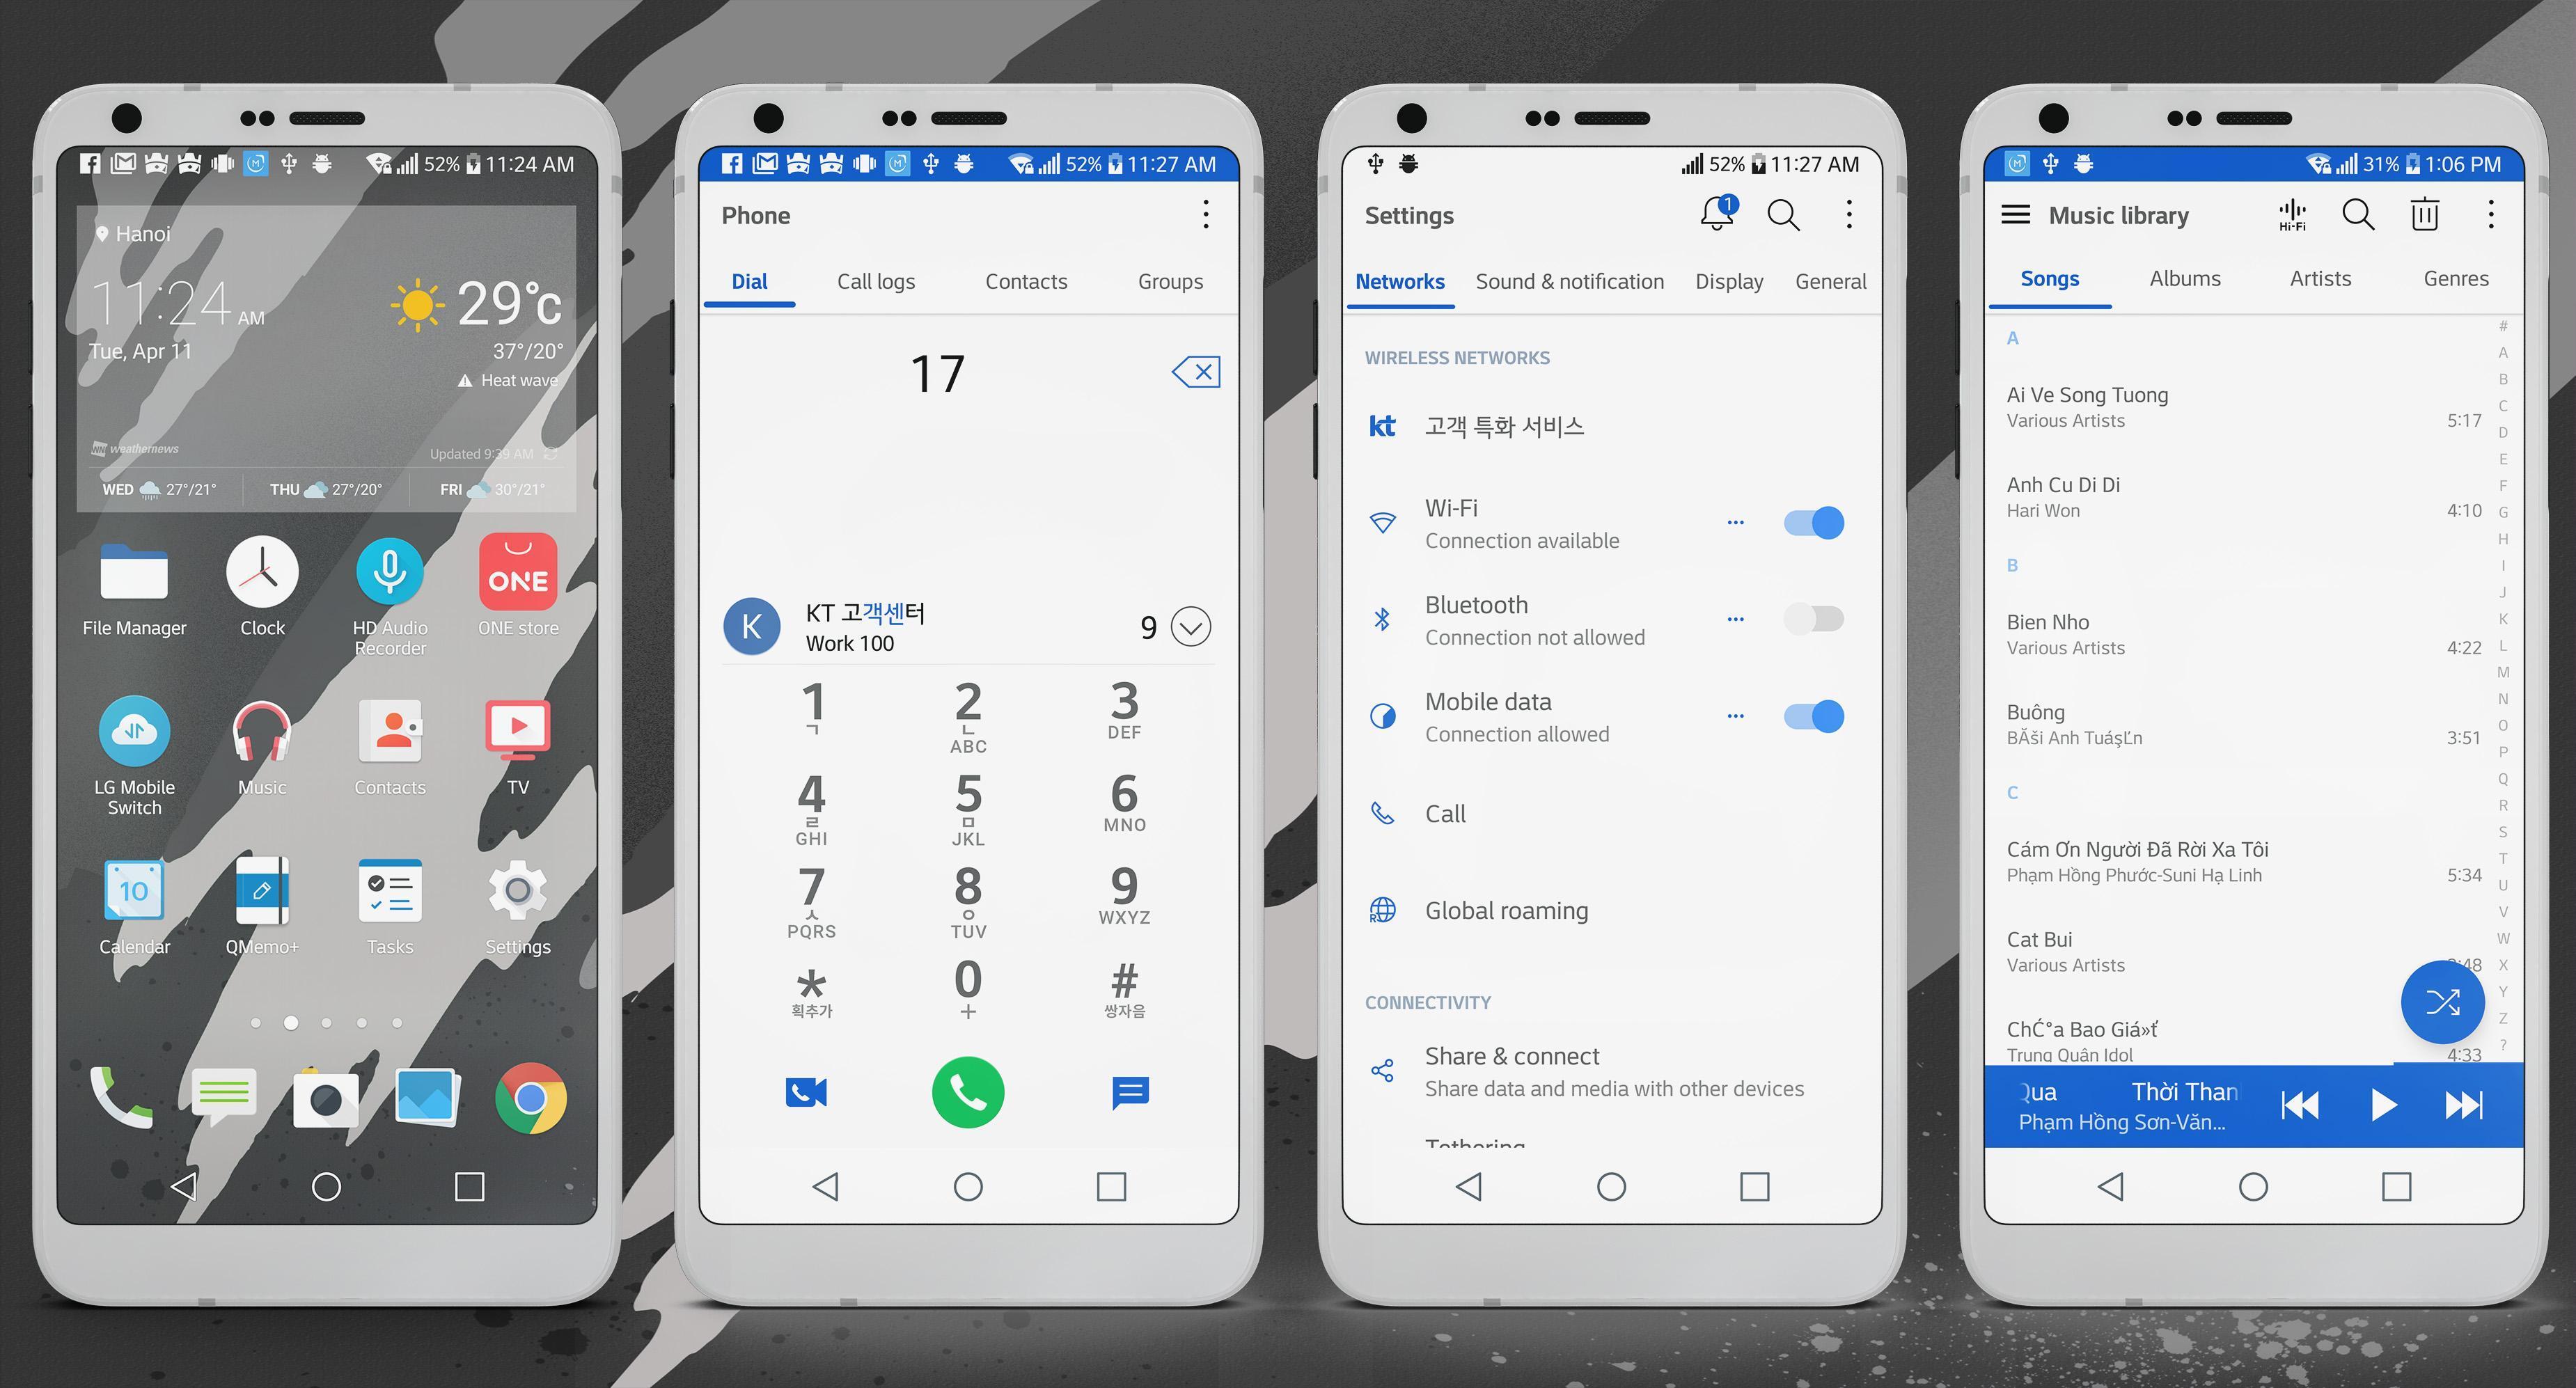 Sense Pro Theme LG G6 V20 & G5 for Android - APK Download